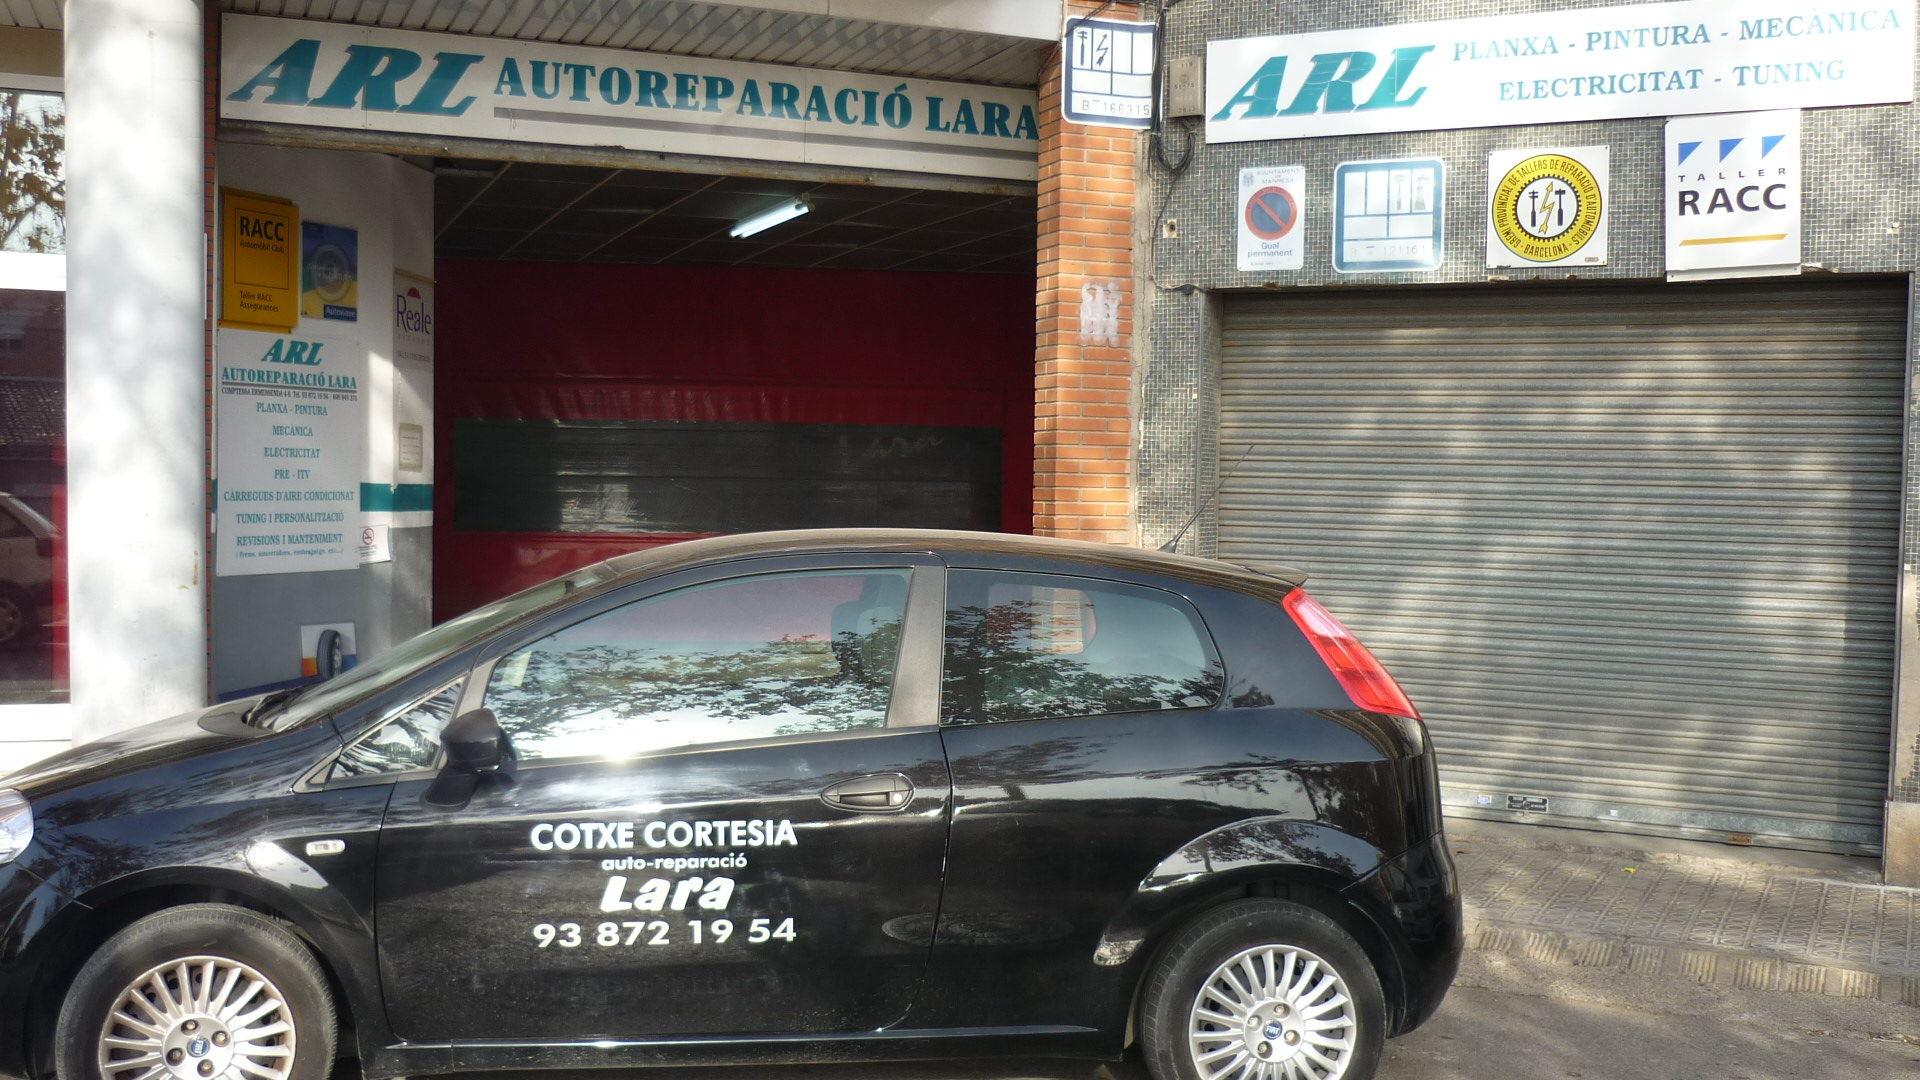 Foto 4 de Talleres de automóviles en Manresa | Autoreparació Lara